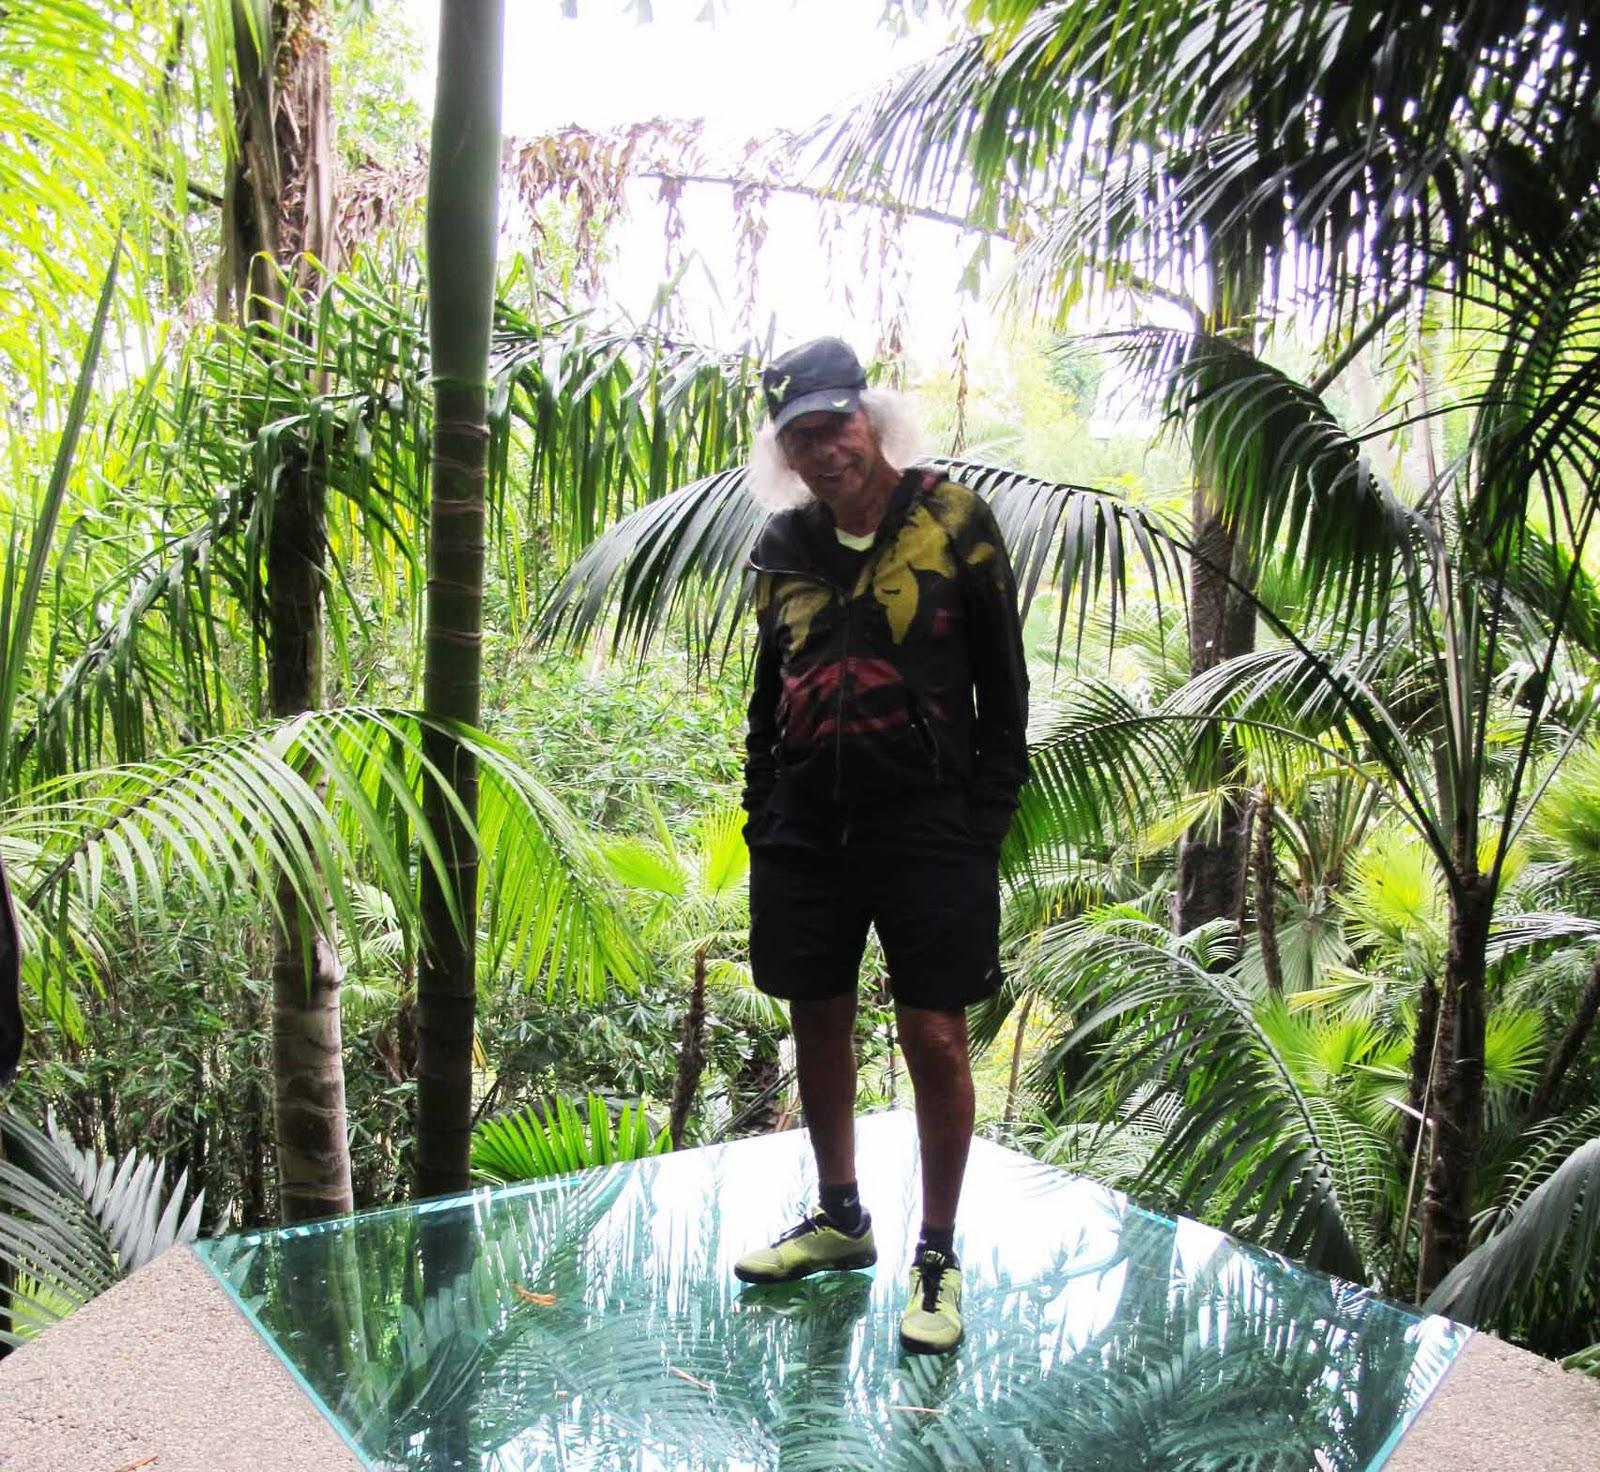 http://2.bp.blogspot.com/_rlhZCdZl2is/TOwyJaxNsHI/AAAAAAAANUA/E9_YHybQQ54/s1600/Jim+Goldstein+at+the+Sheats+Goldstein+house+by+John+Lautner+Beverly+Hills+Los+Angeles.jpg